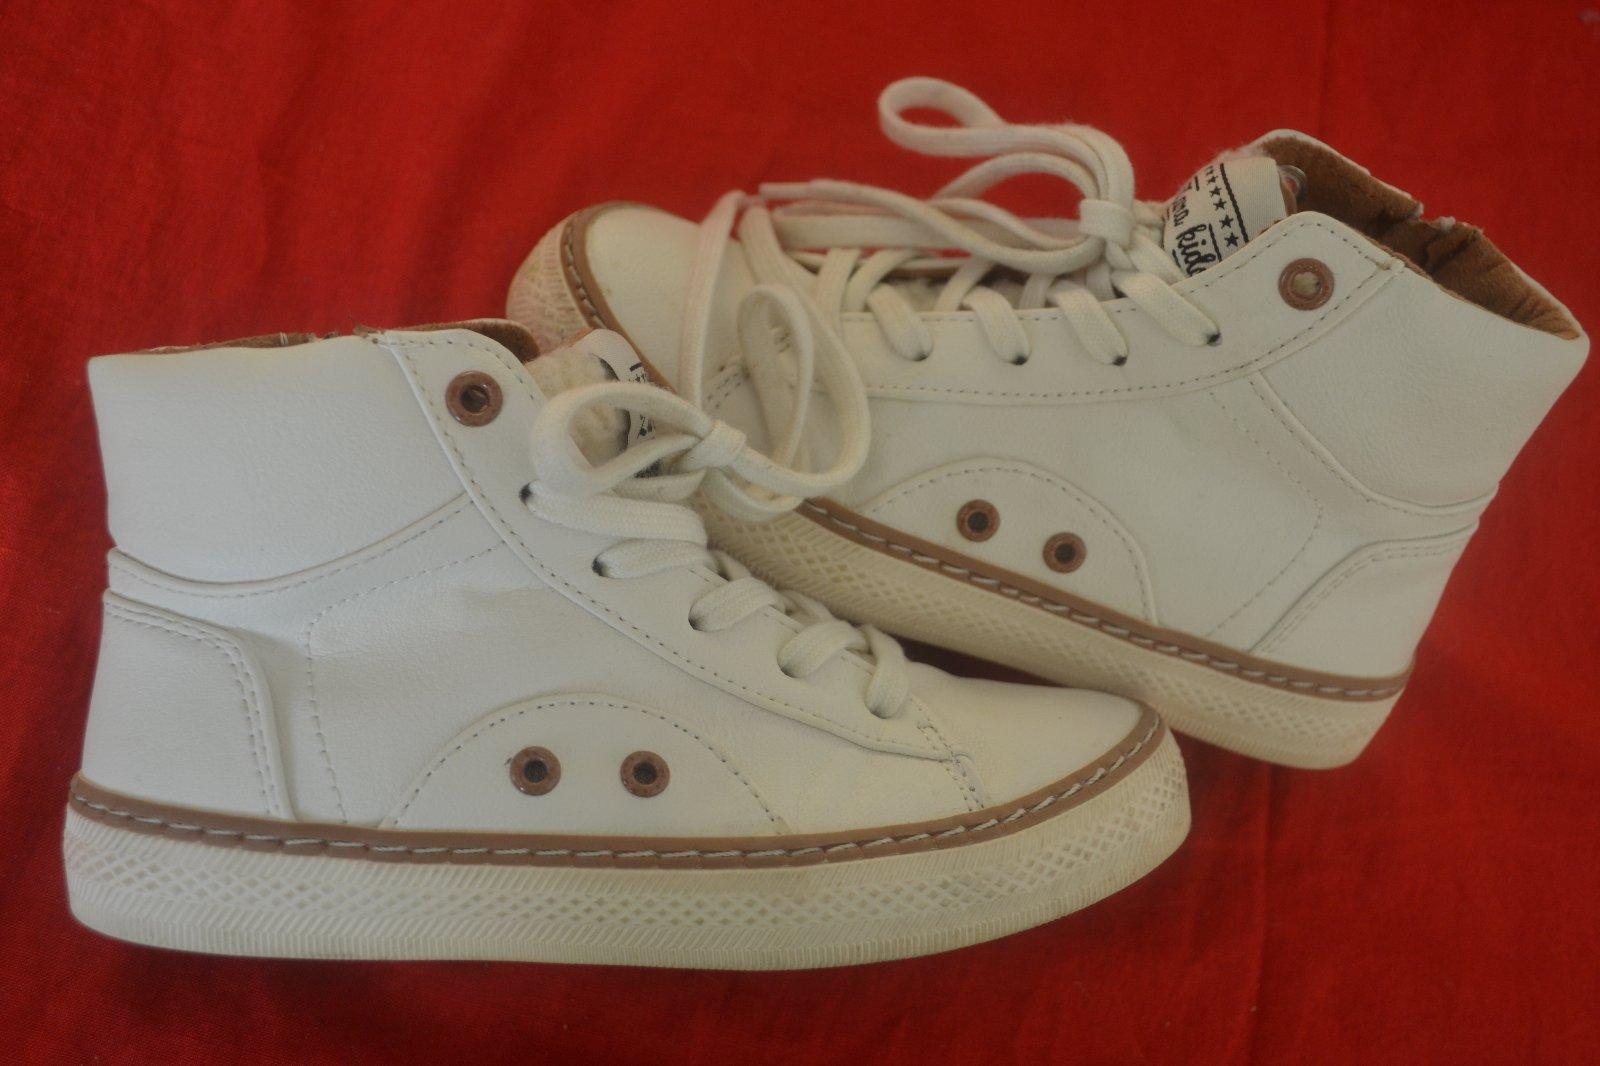 38a10a11d5 Sportovní kožené boty zara 28 29